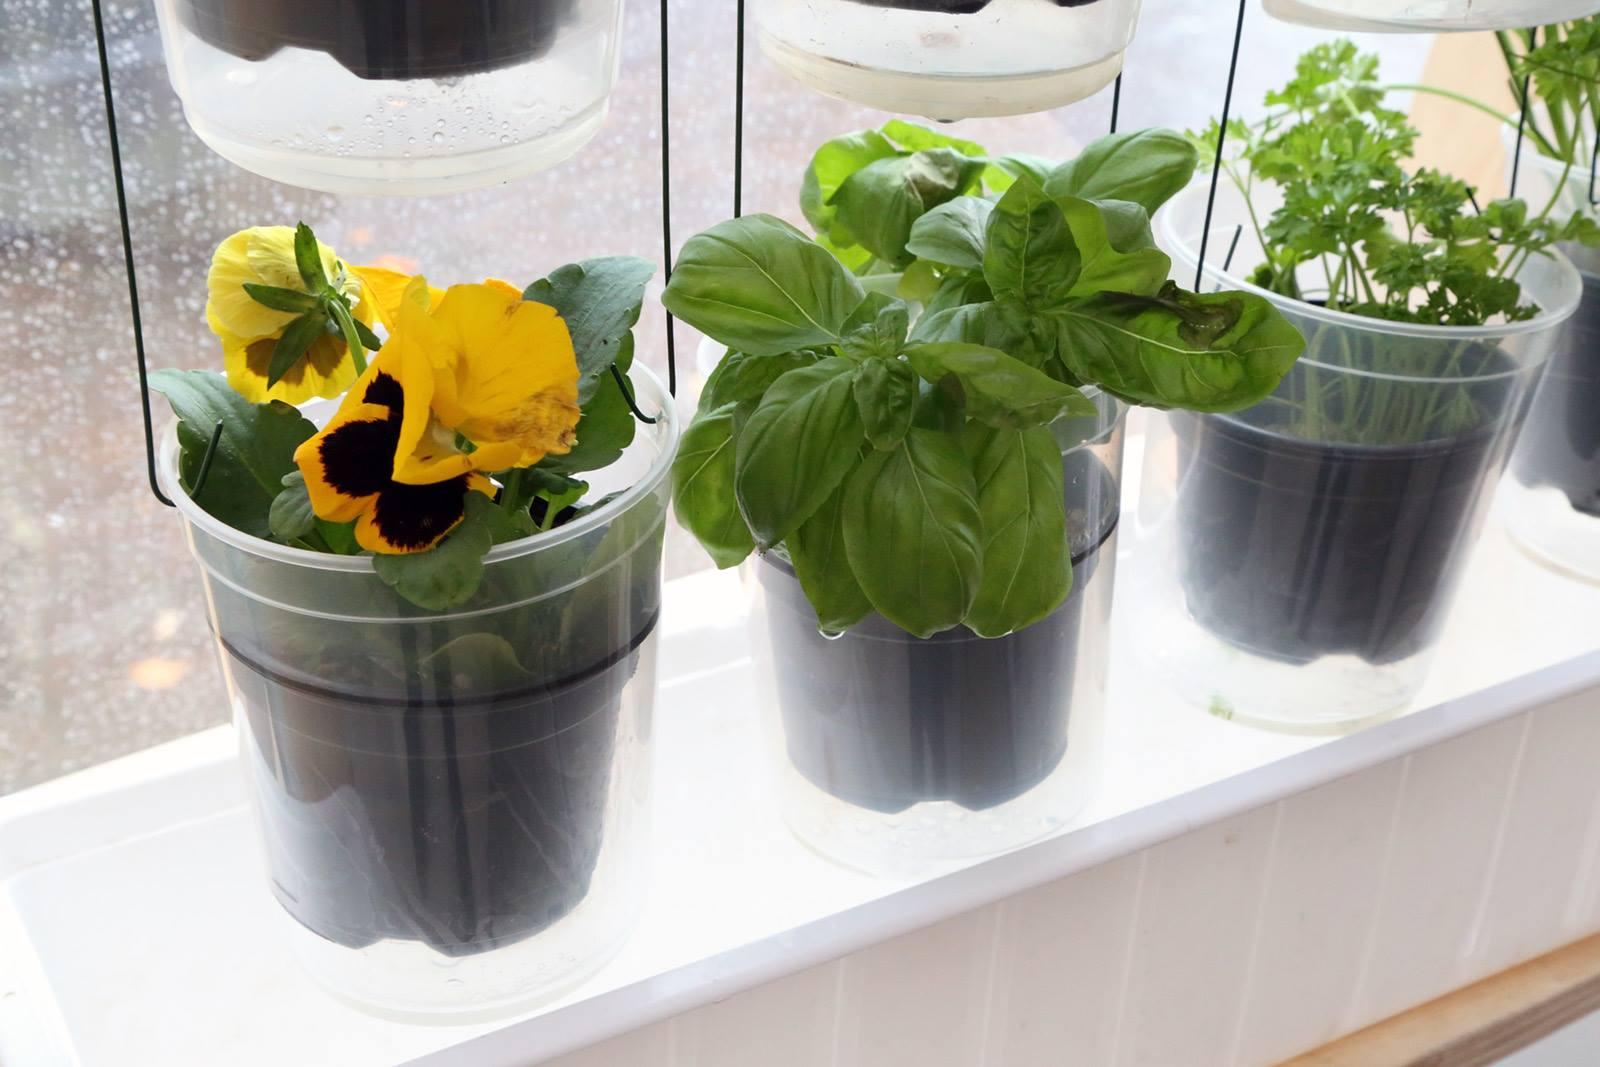 Windowfarm Modulair System (7)